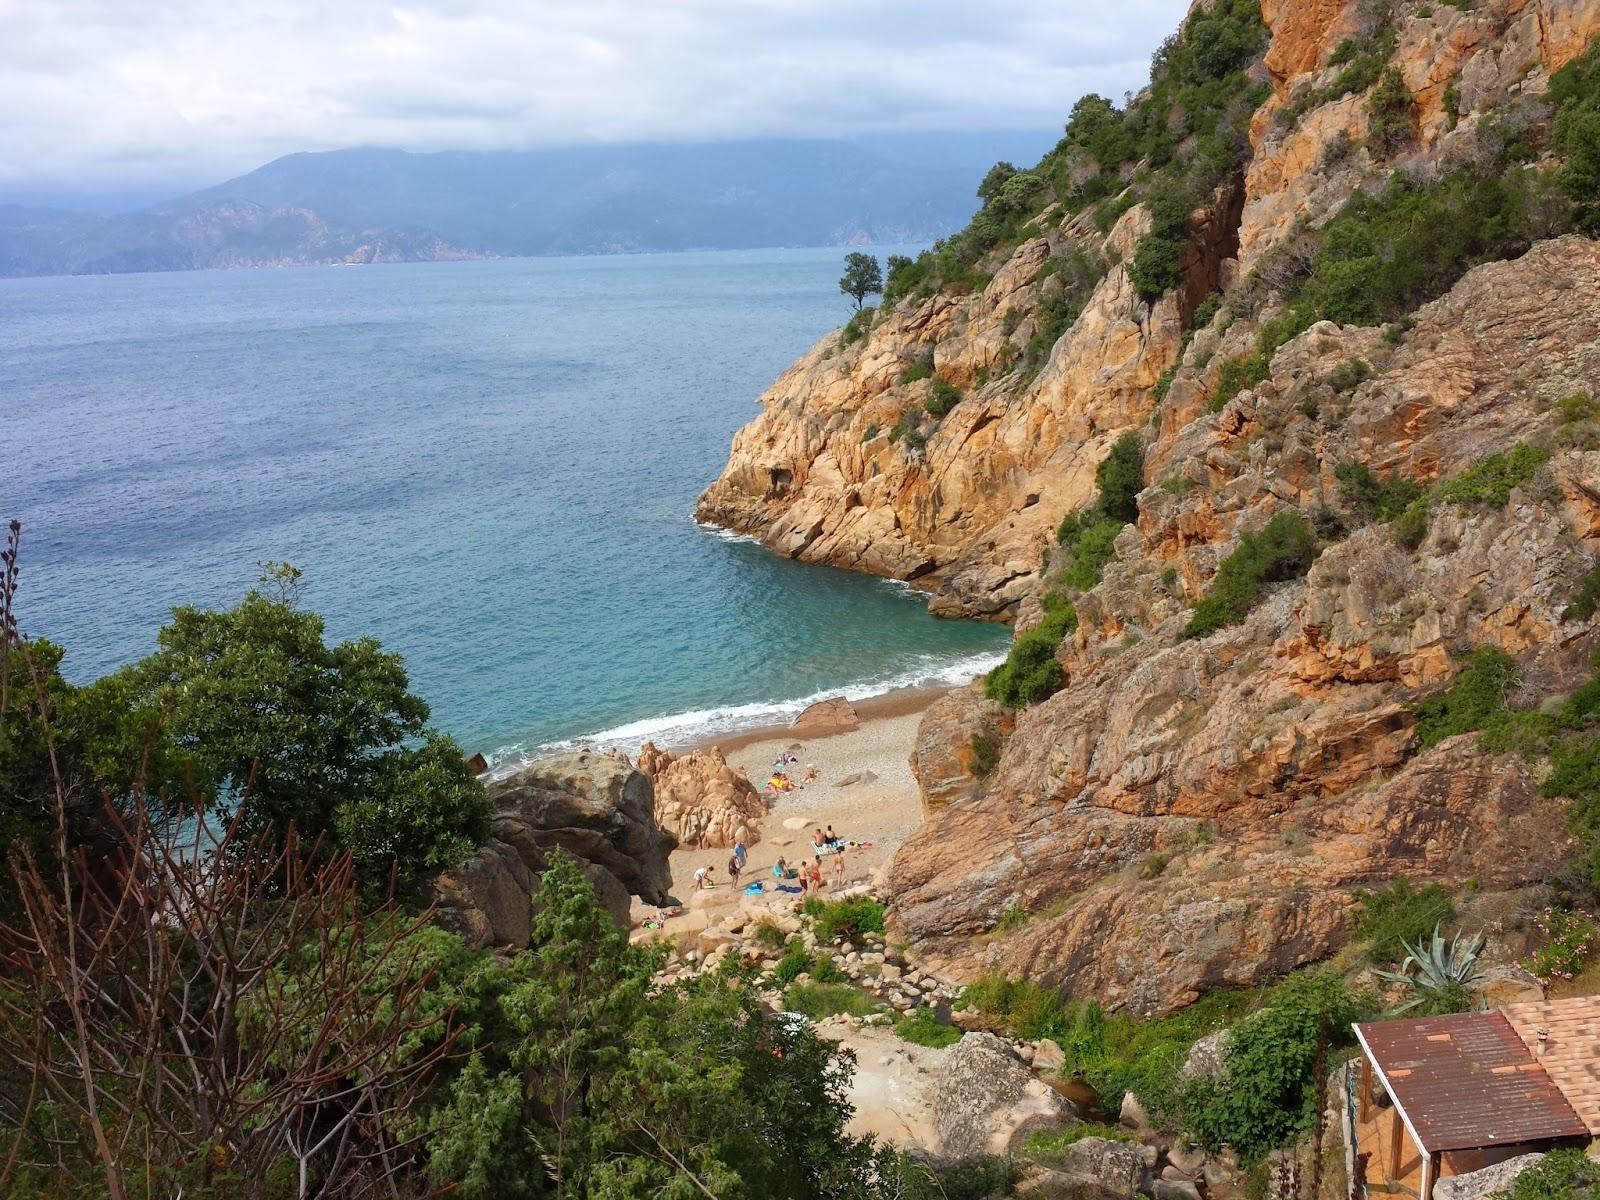 Plage de Ficajola - Corse